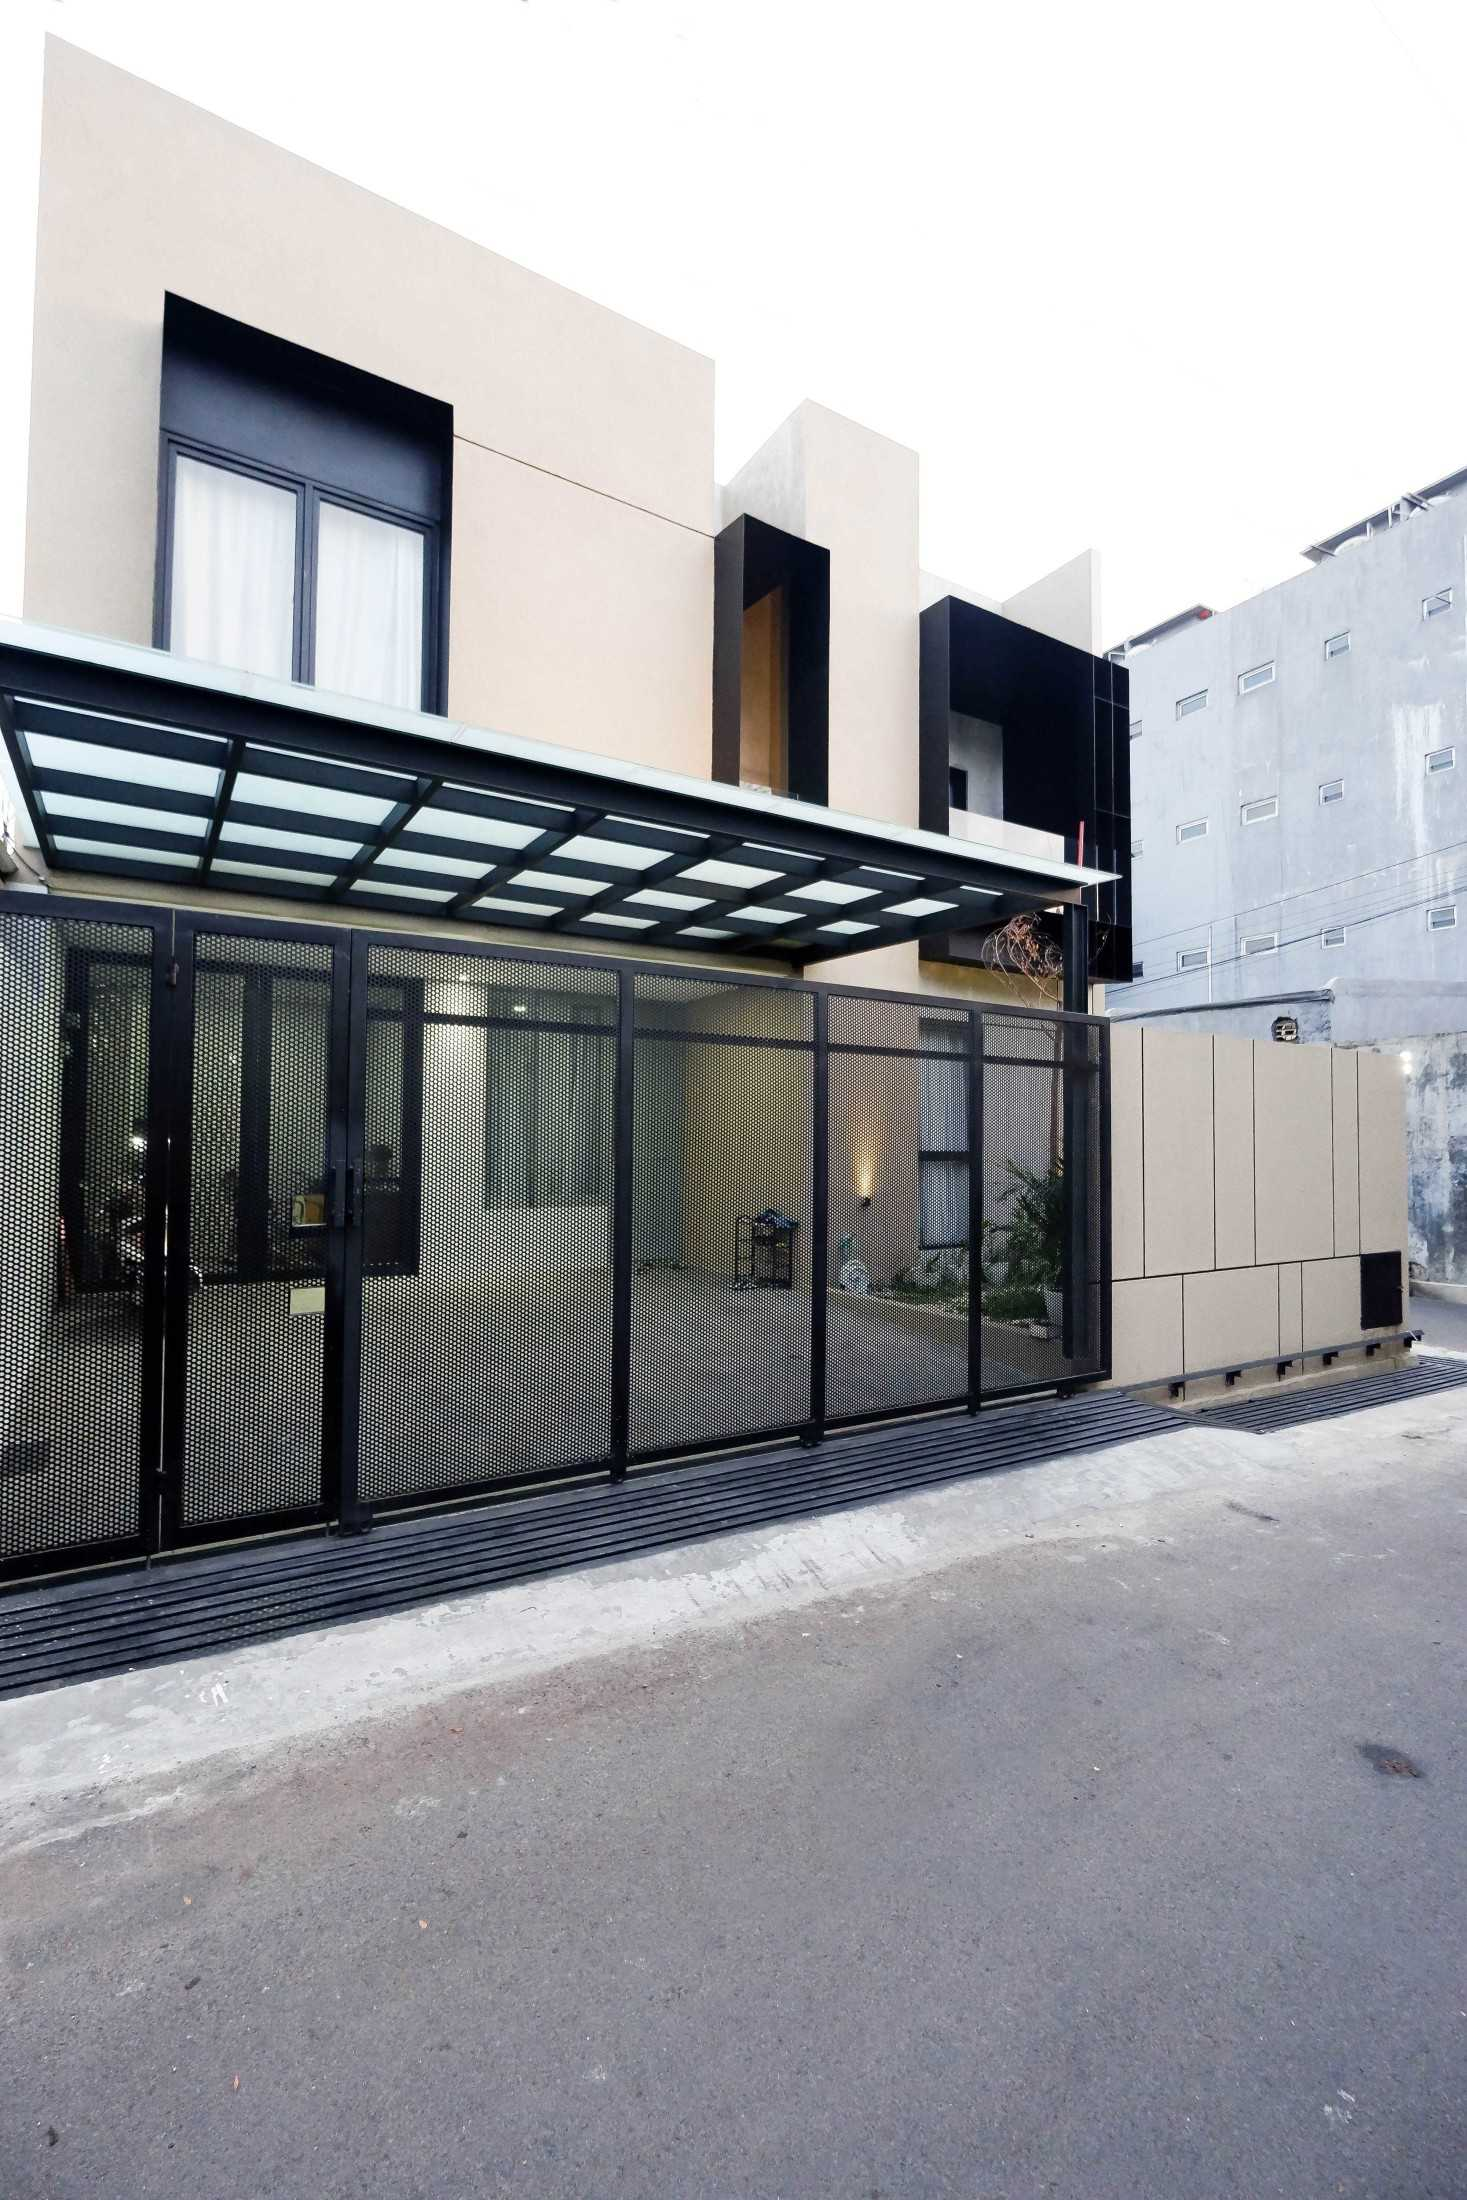 Natabumi Studio Melinjo House Jakarta, Daerah Khusus Ibukota Jakarta, Indonesia Jakarta, Daerah Khusus Ibukota Jakarta, Indonesia Natabumi-Studio-Melinjo-House  126353